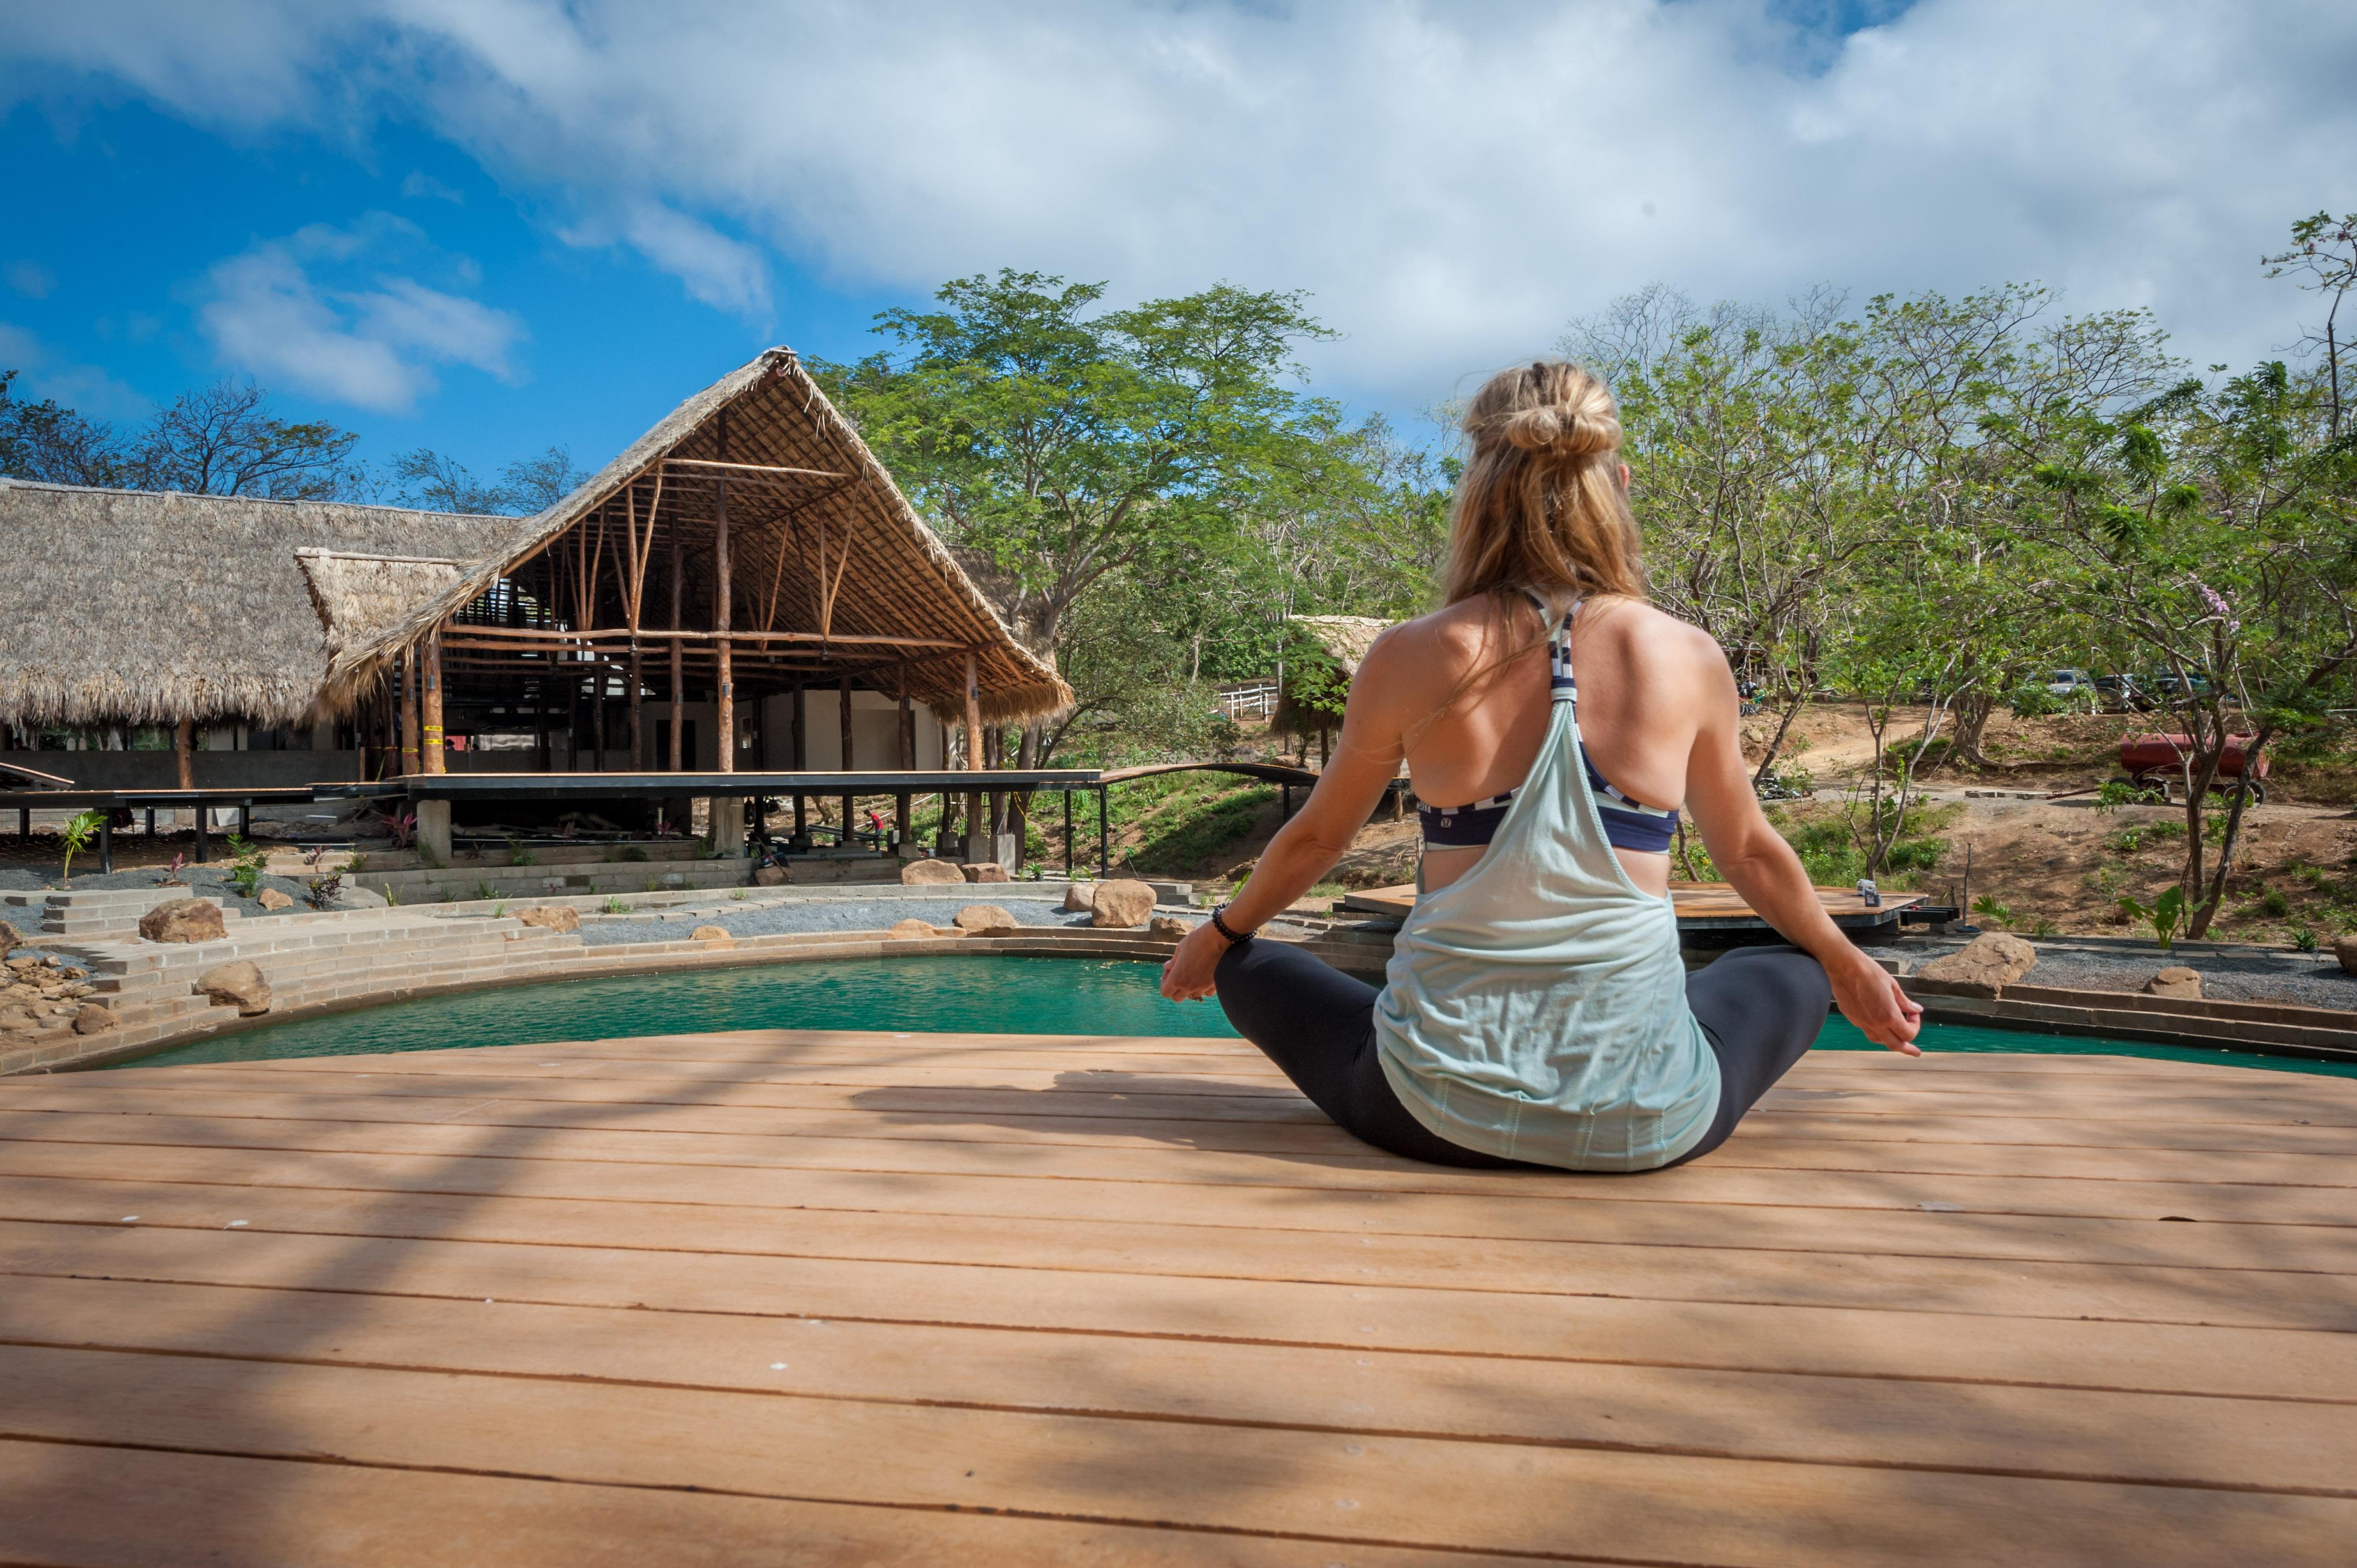 200 Hour Jai Yoga Teacher Training with Ella Luckett: APRIL 19 – MAY 10 2017 Tree House Resort